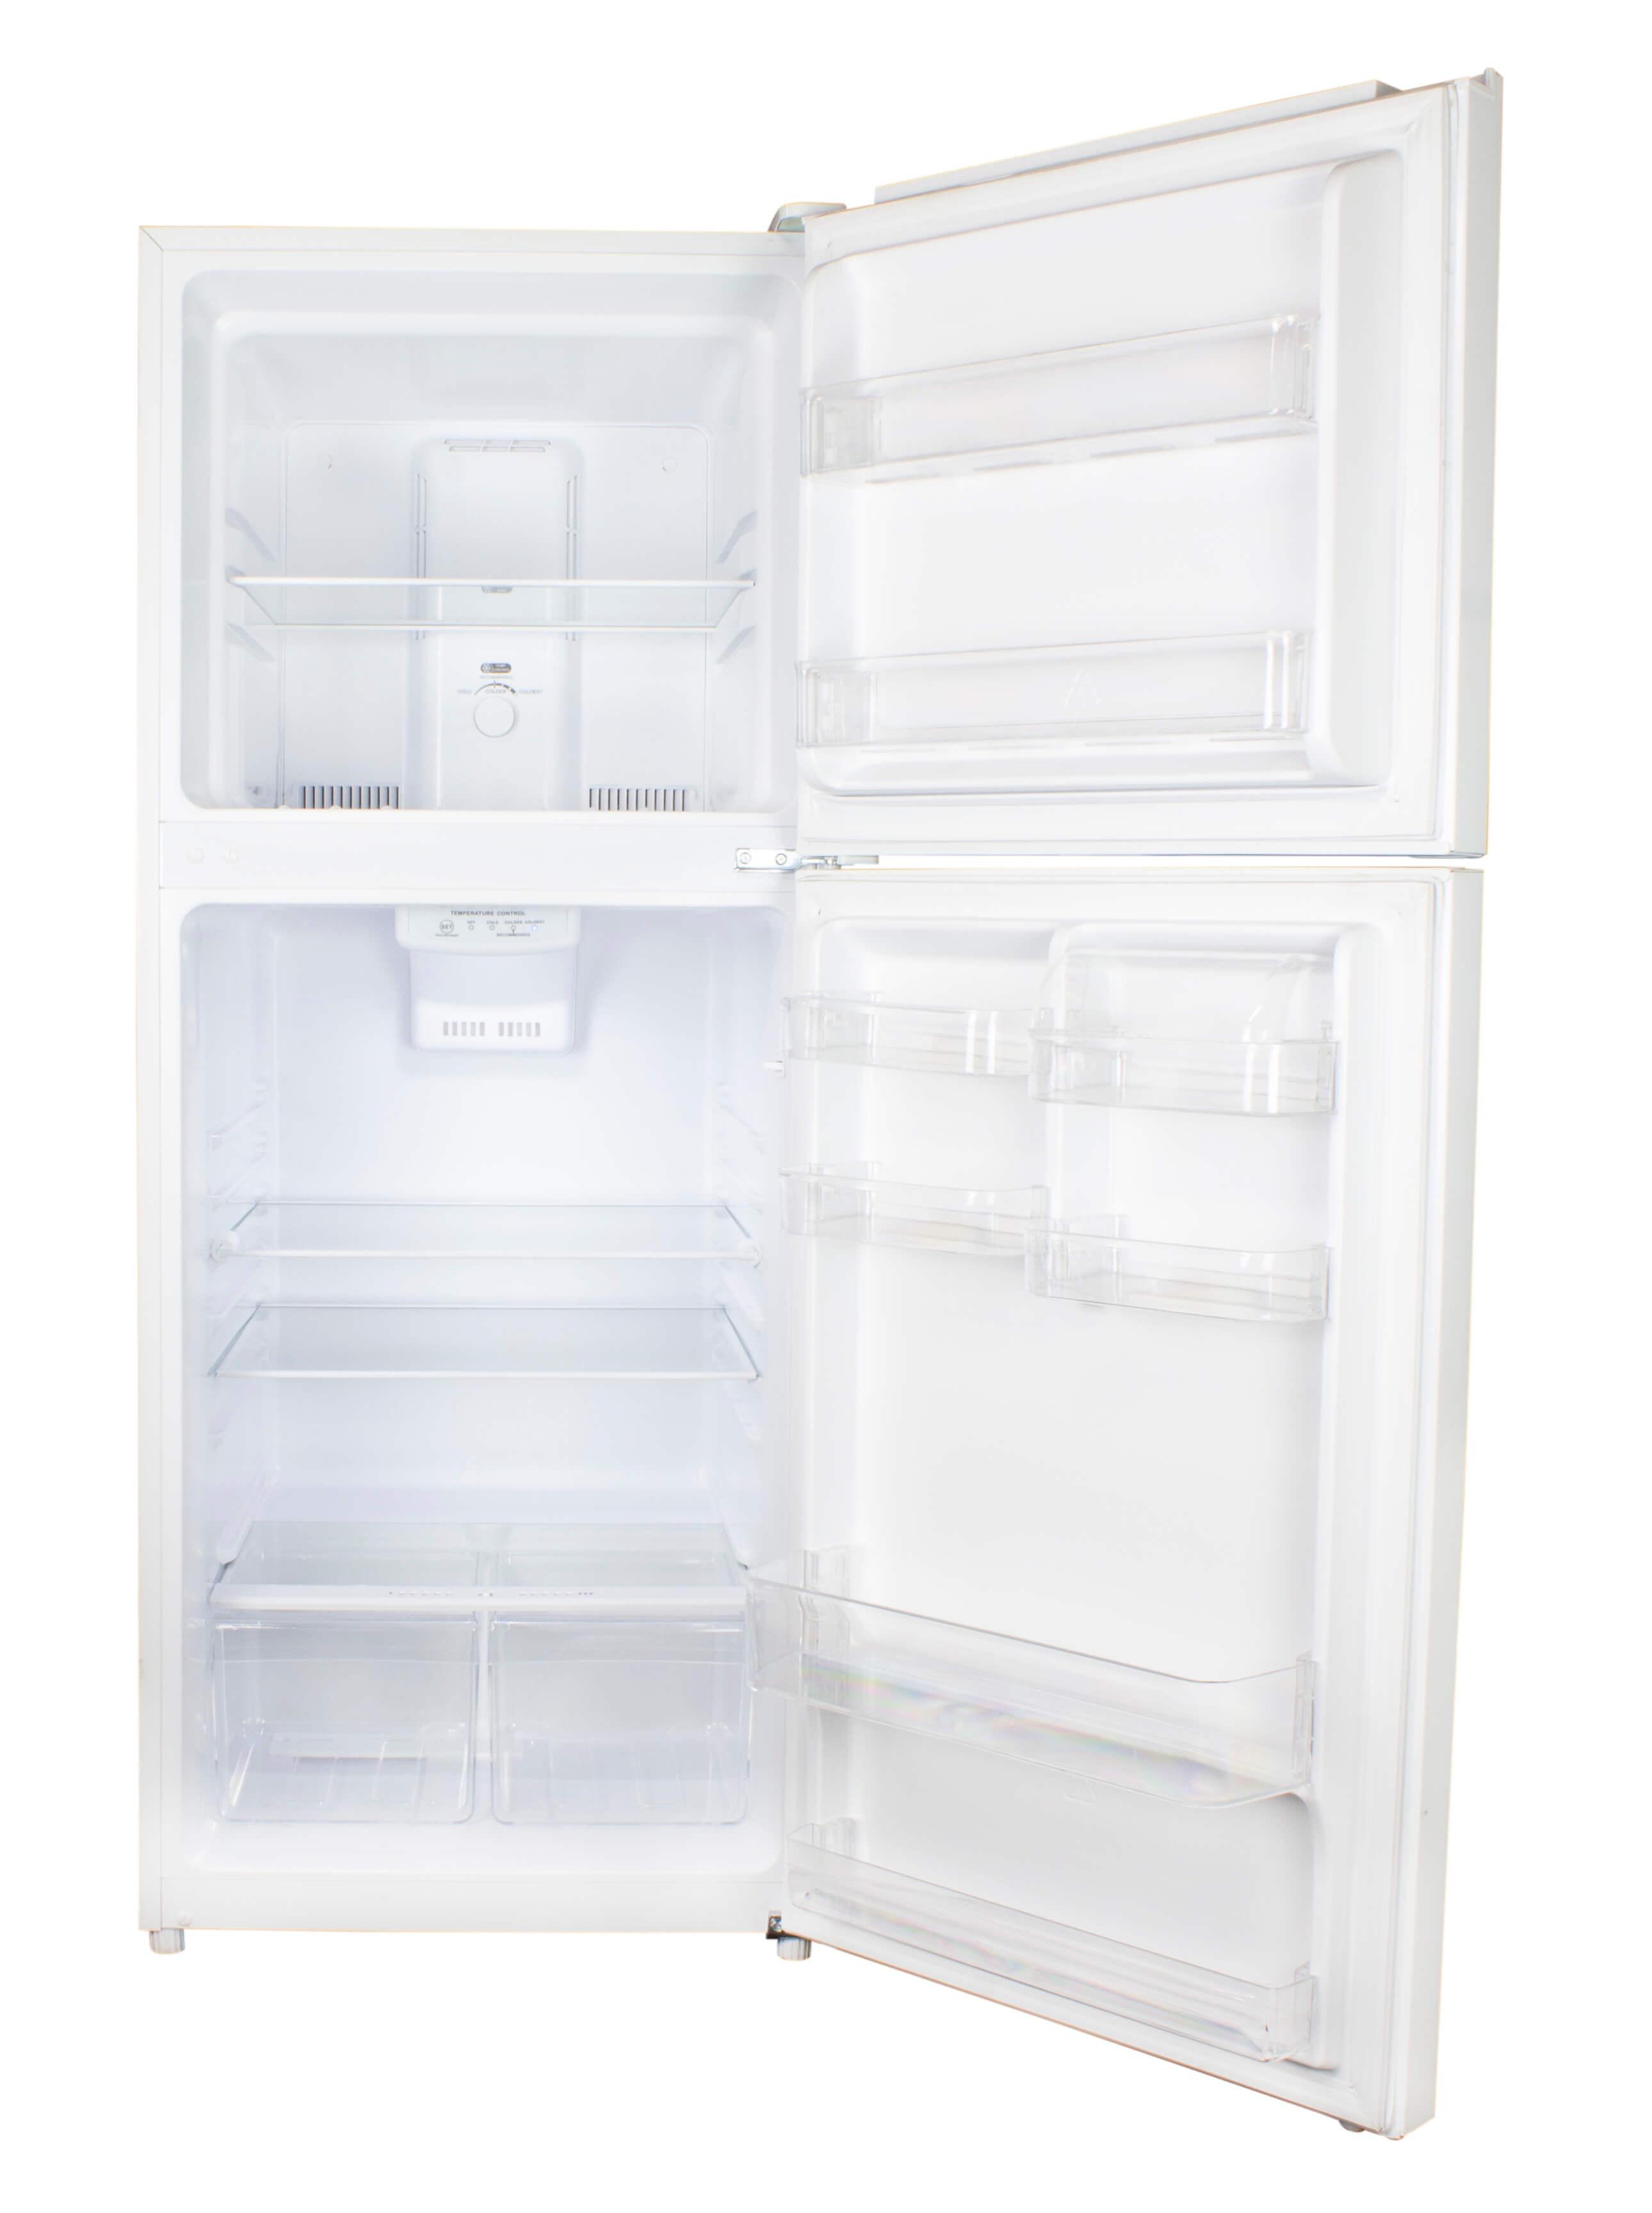 Danby 12 Cu. Ft. Apartment Size Refrigerator